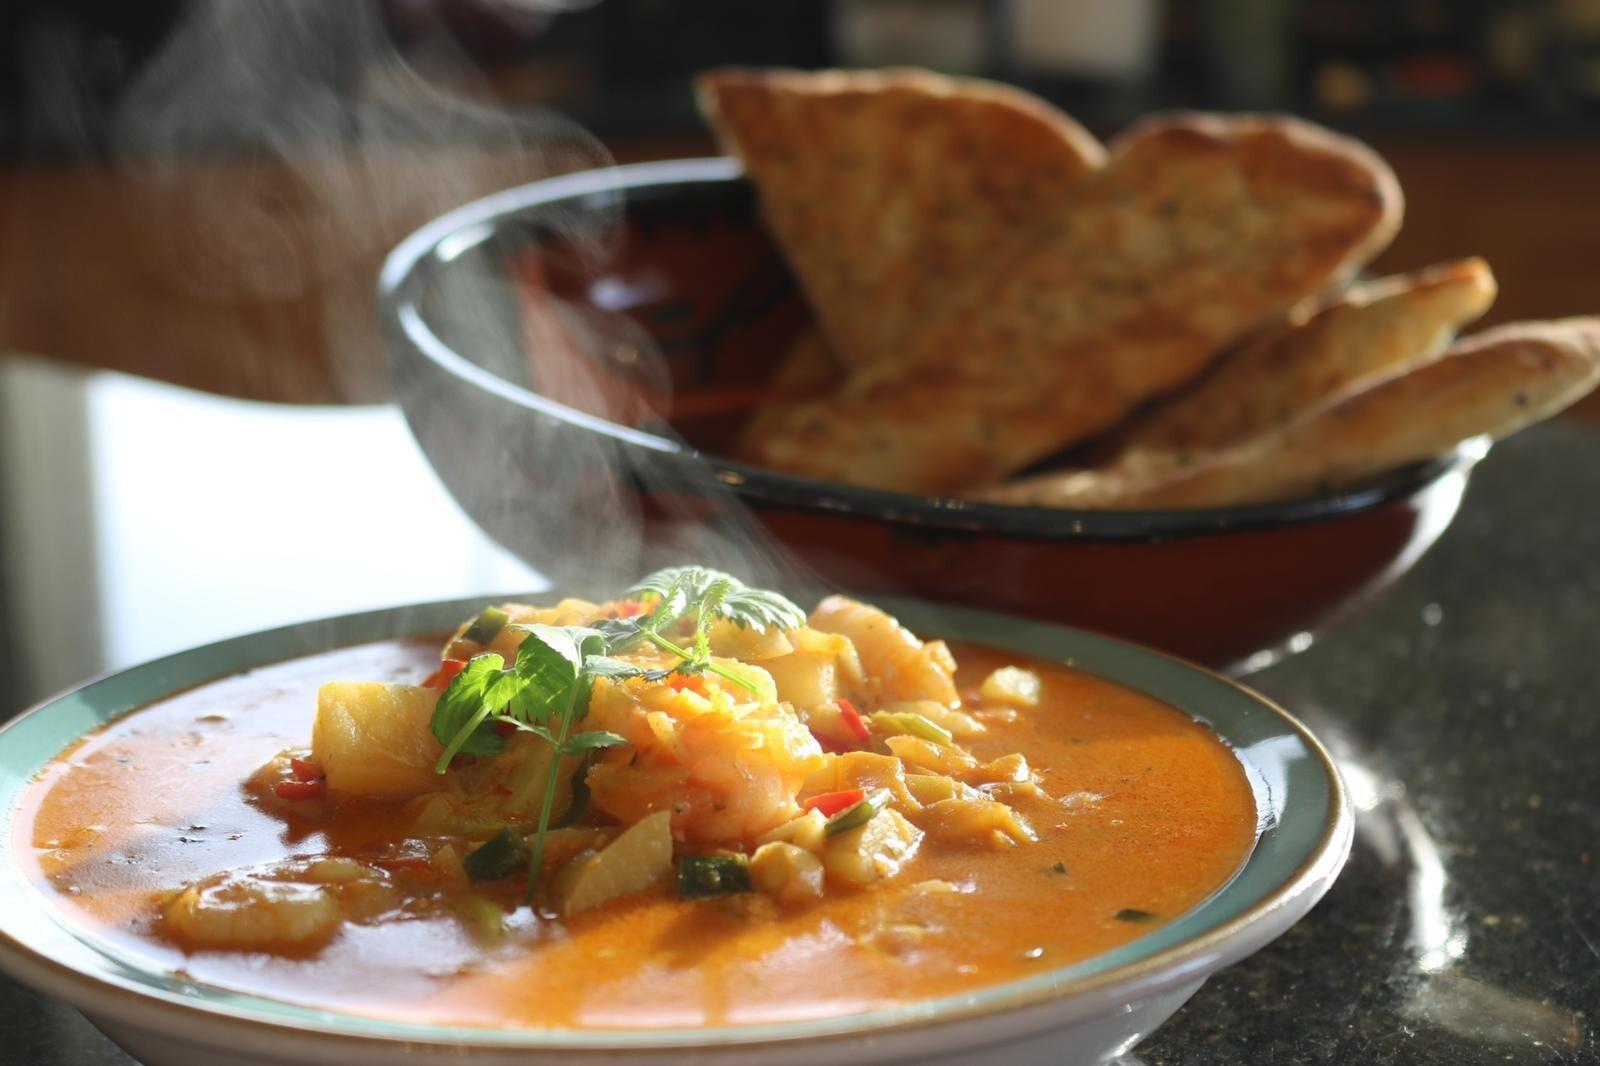 Prawn & Potato Thai Yellow Curry by Siobhán Devereux Doyle